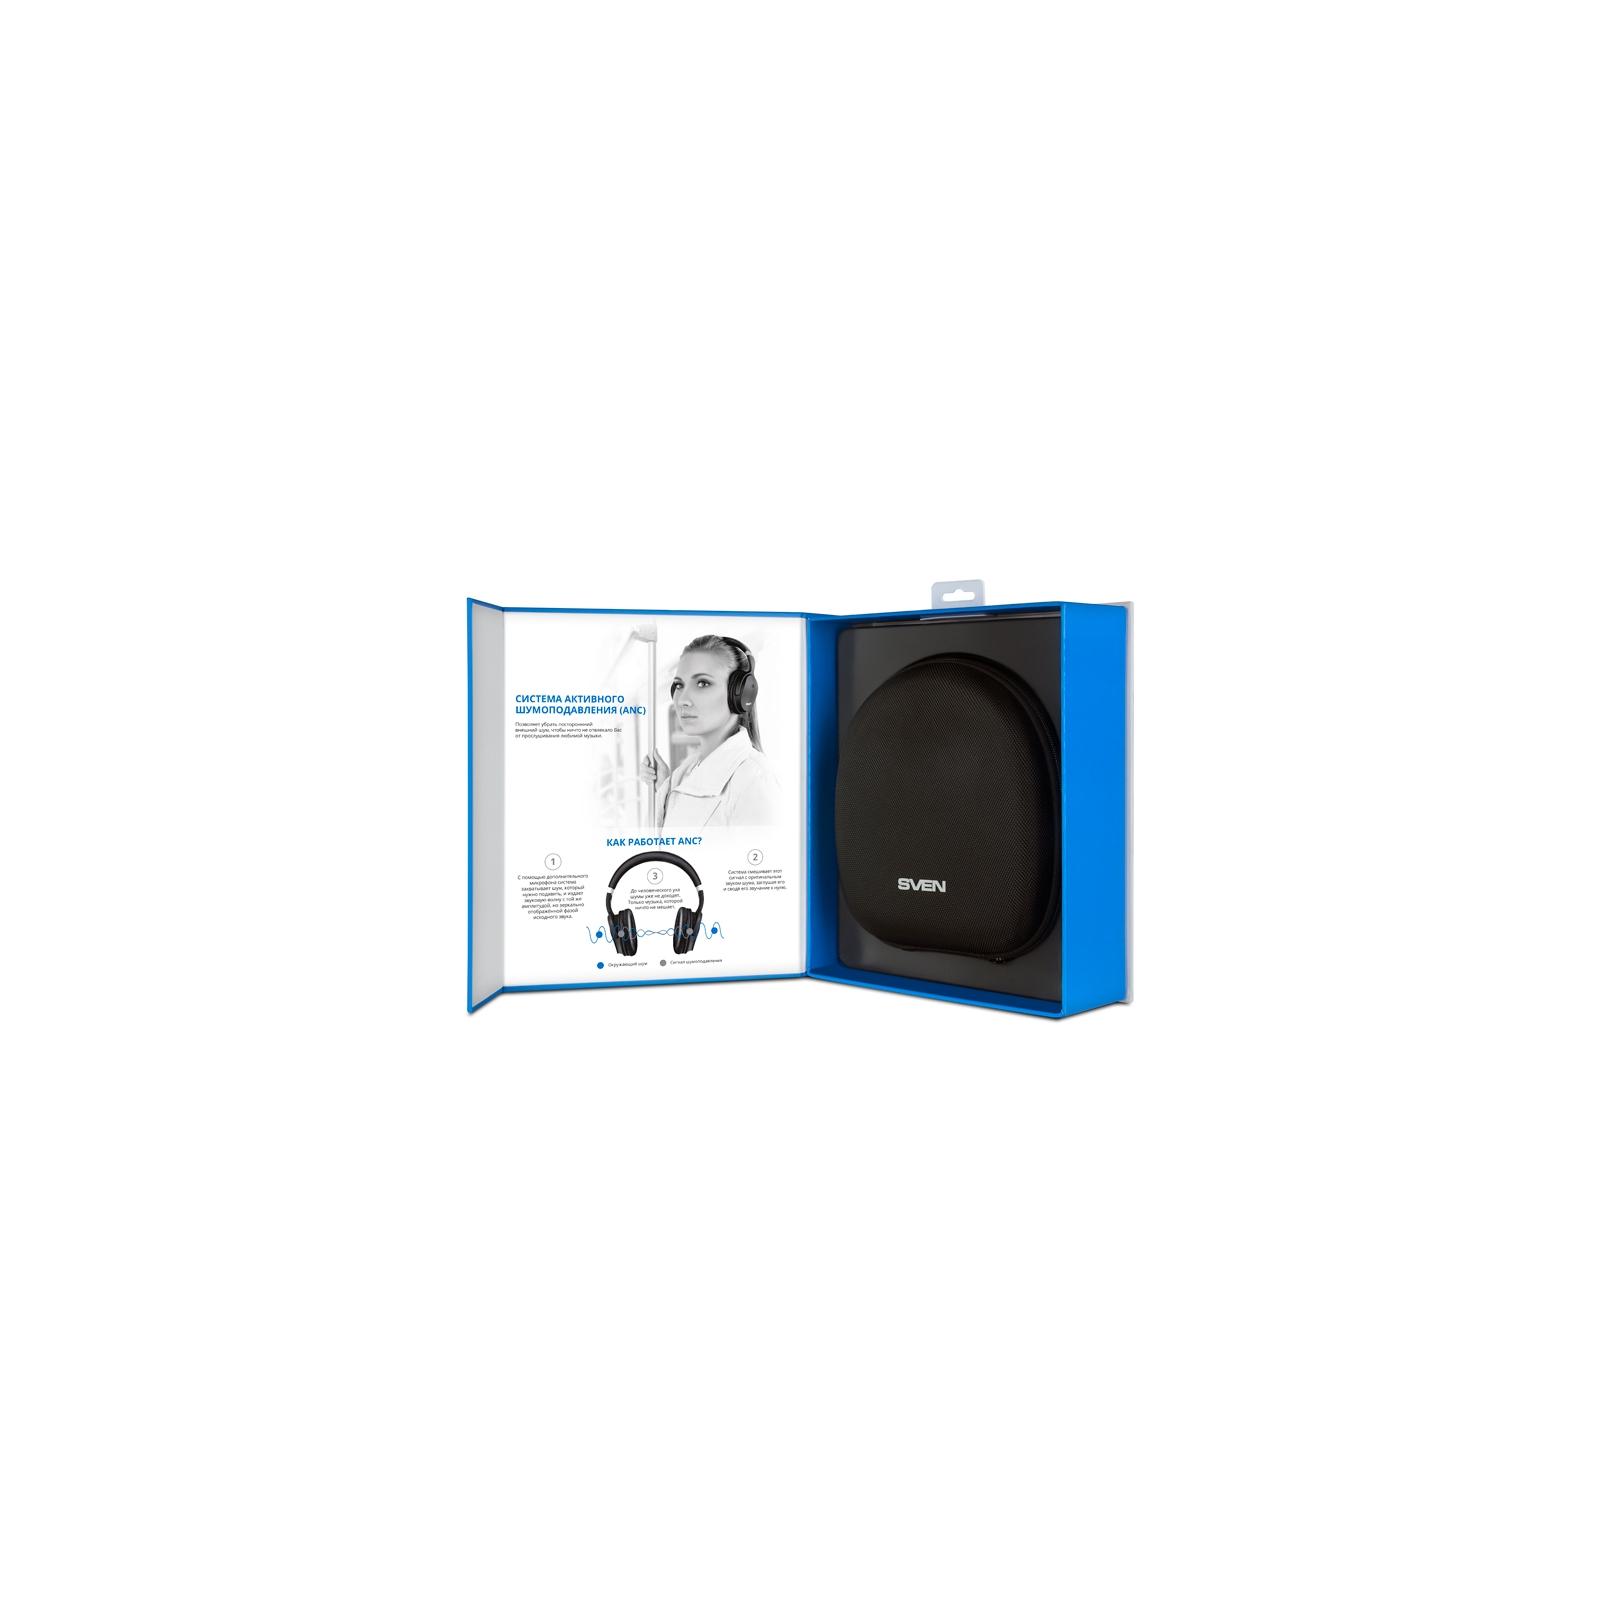 Наушники Sven AP-B900MV Black Bluetooth (AP-B900MV black) изображение 9